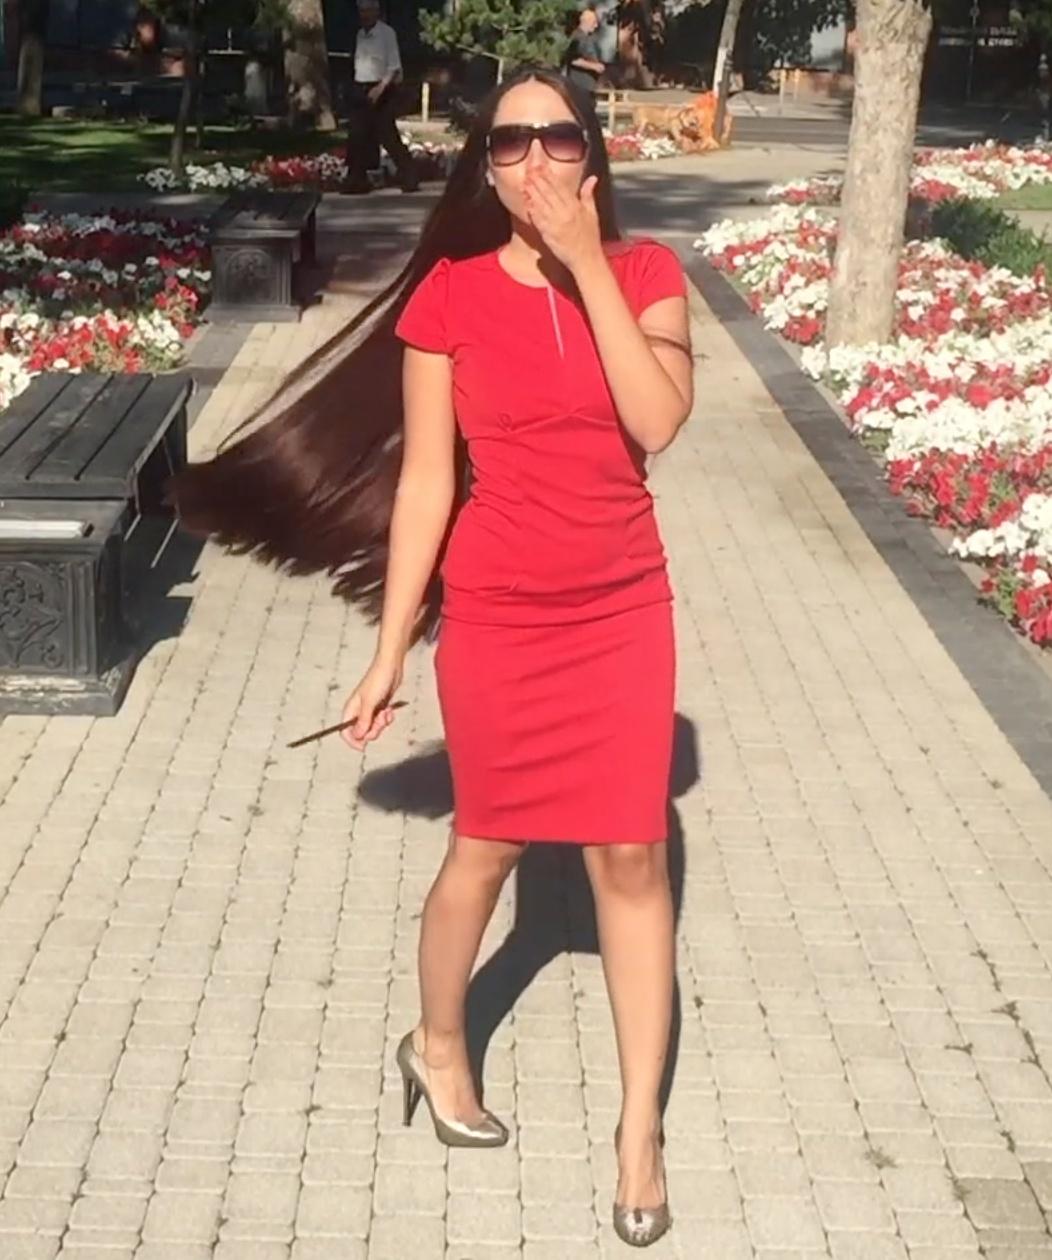 VIDEO - Red elegance